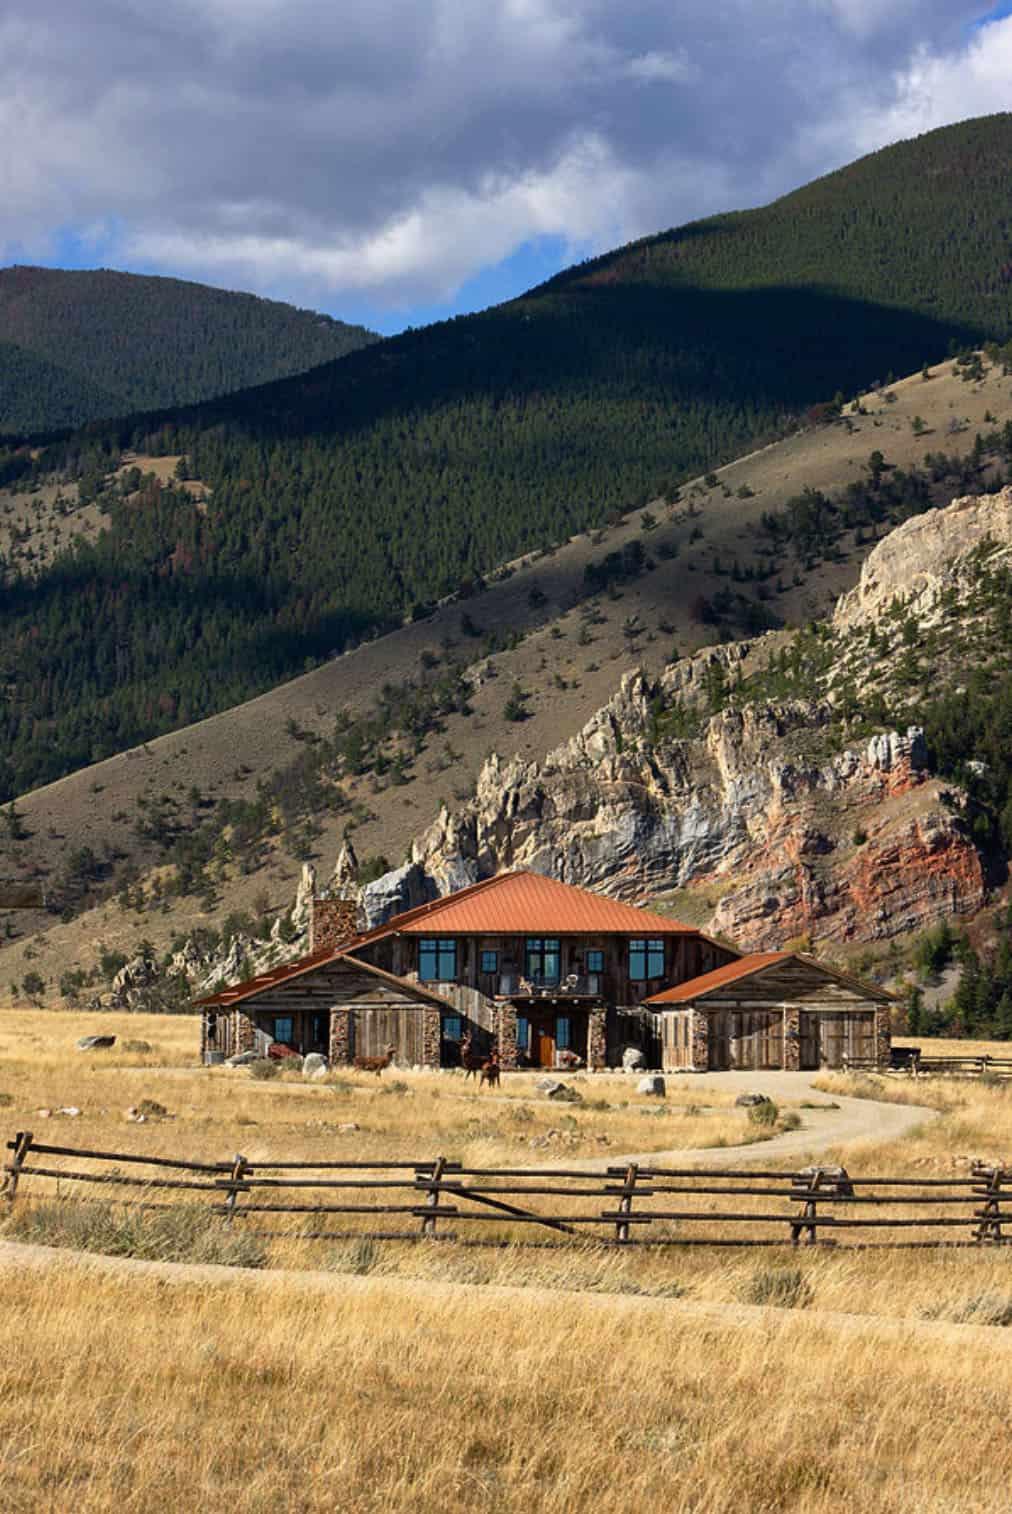 rustic-mountain-home-landscape